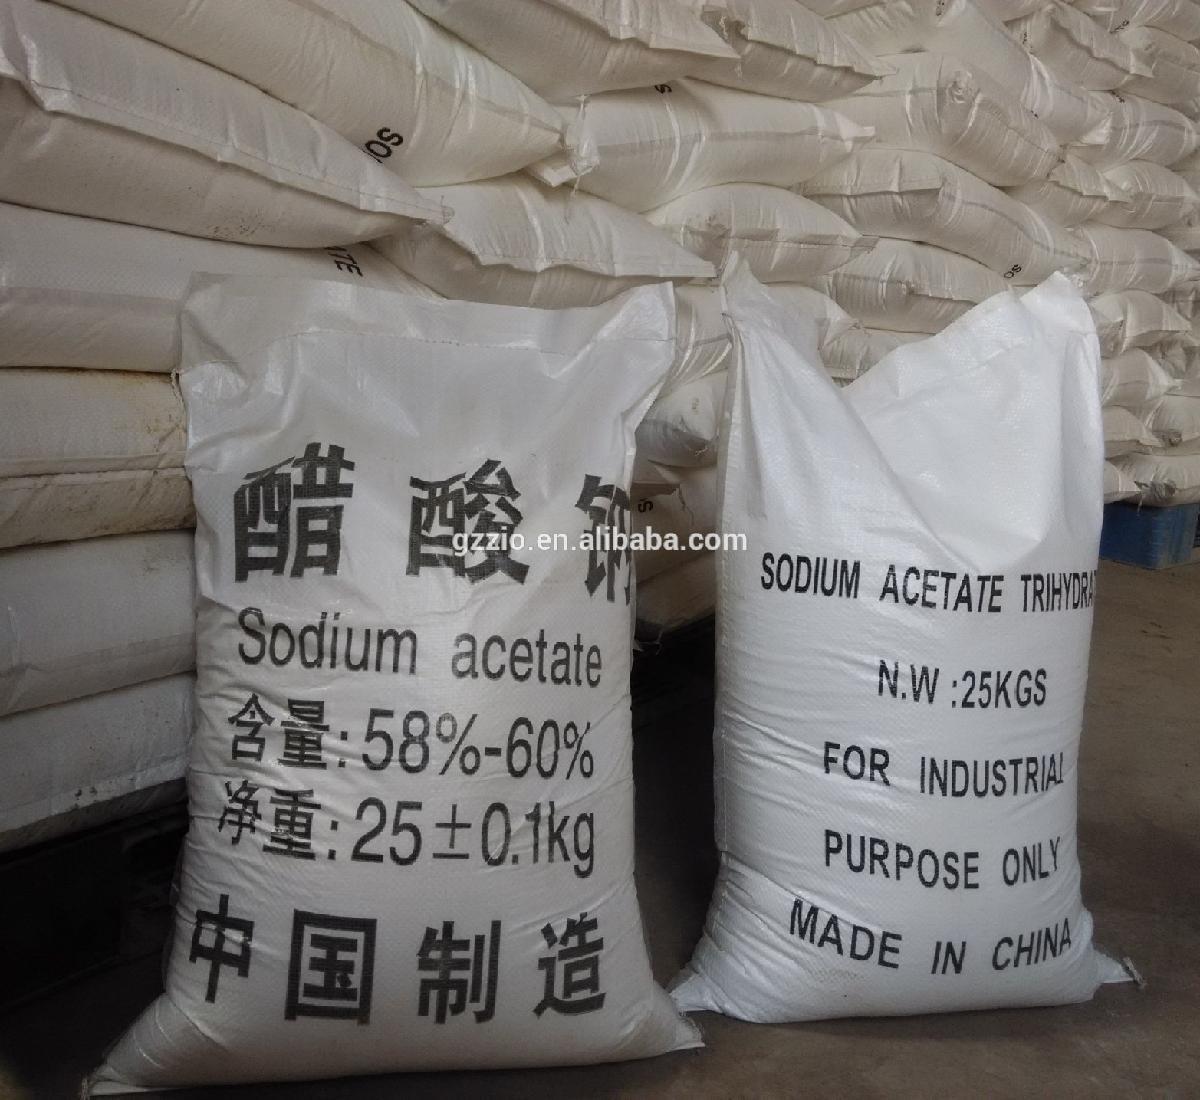 High purity CAS 6131-90-4 hot pack sodium acetate trihydrate price